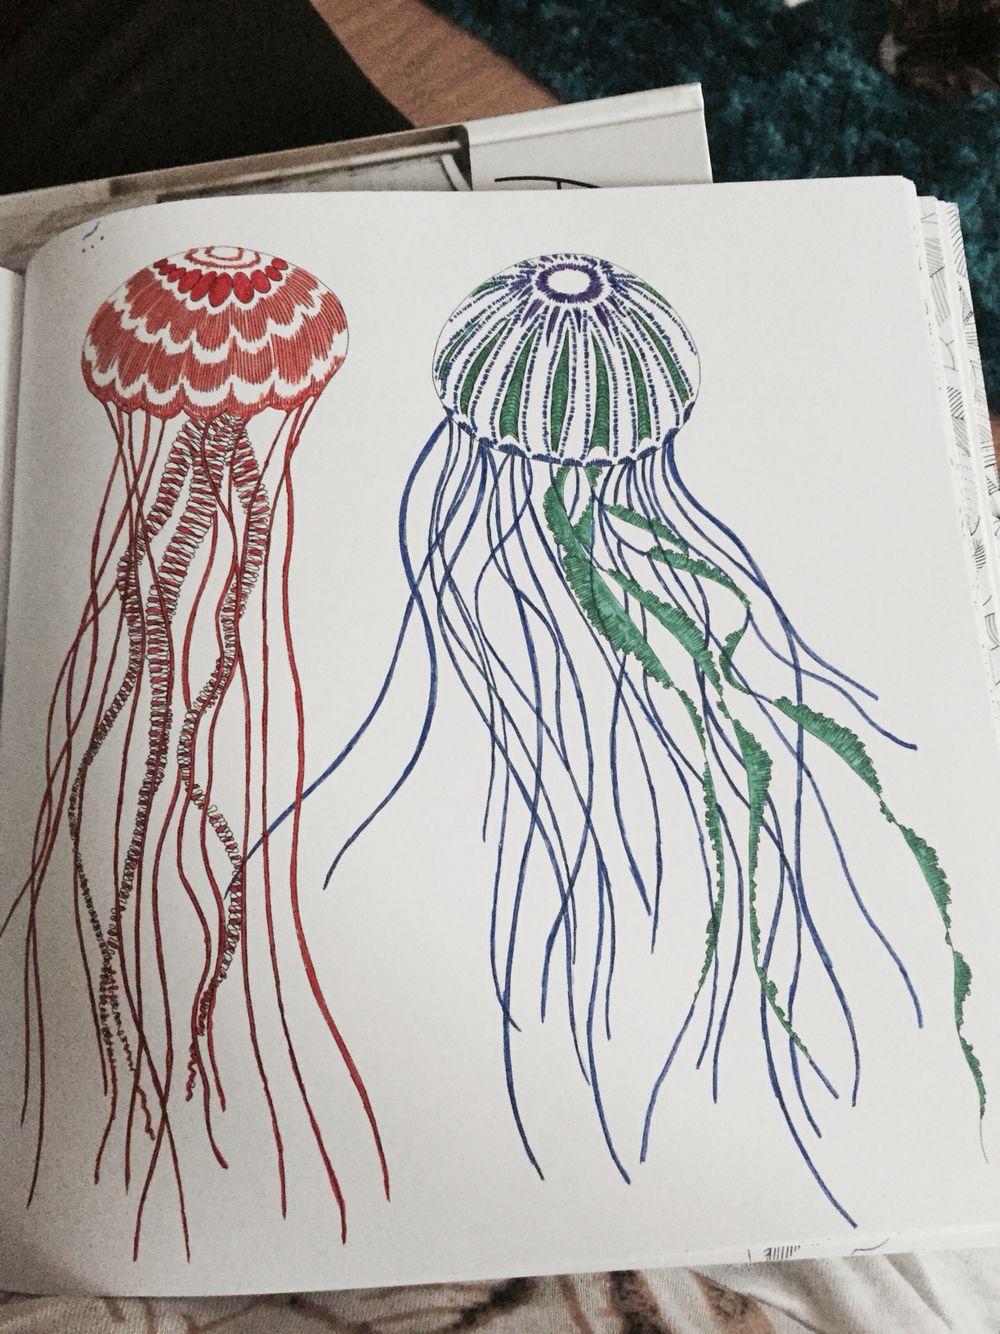 Jellyfish from Millie Marotta's Animal Kingdom